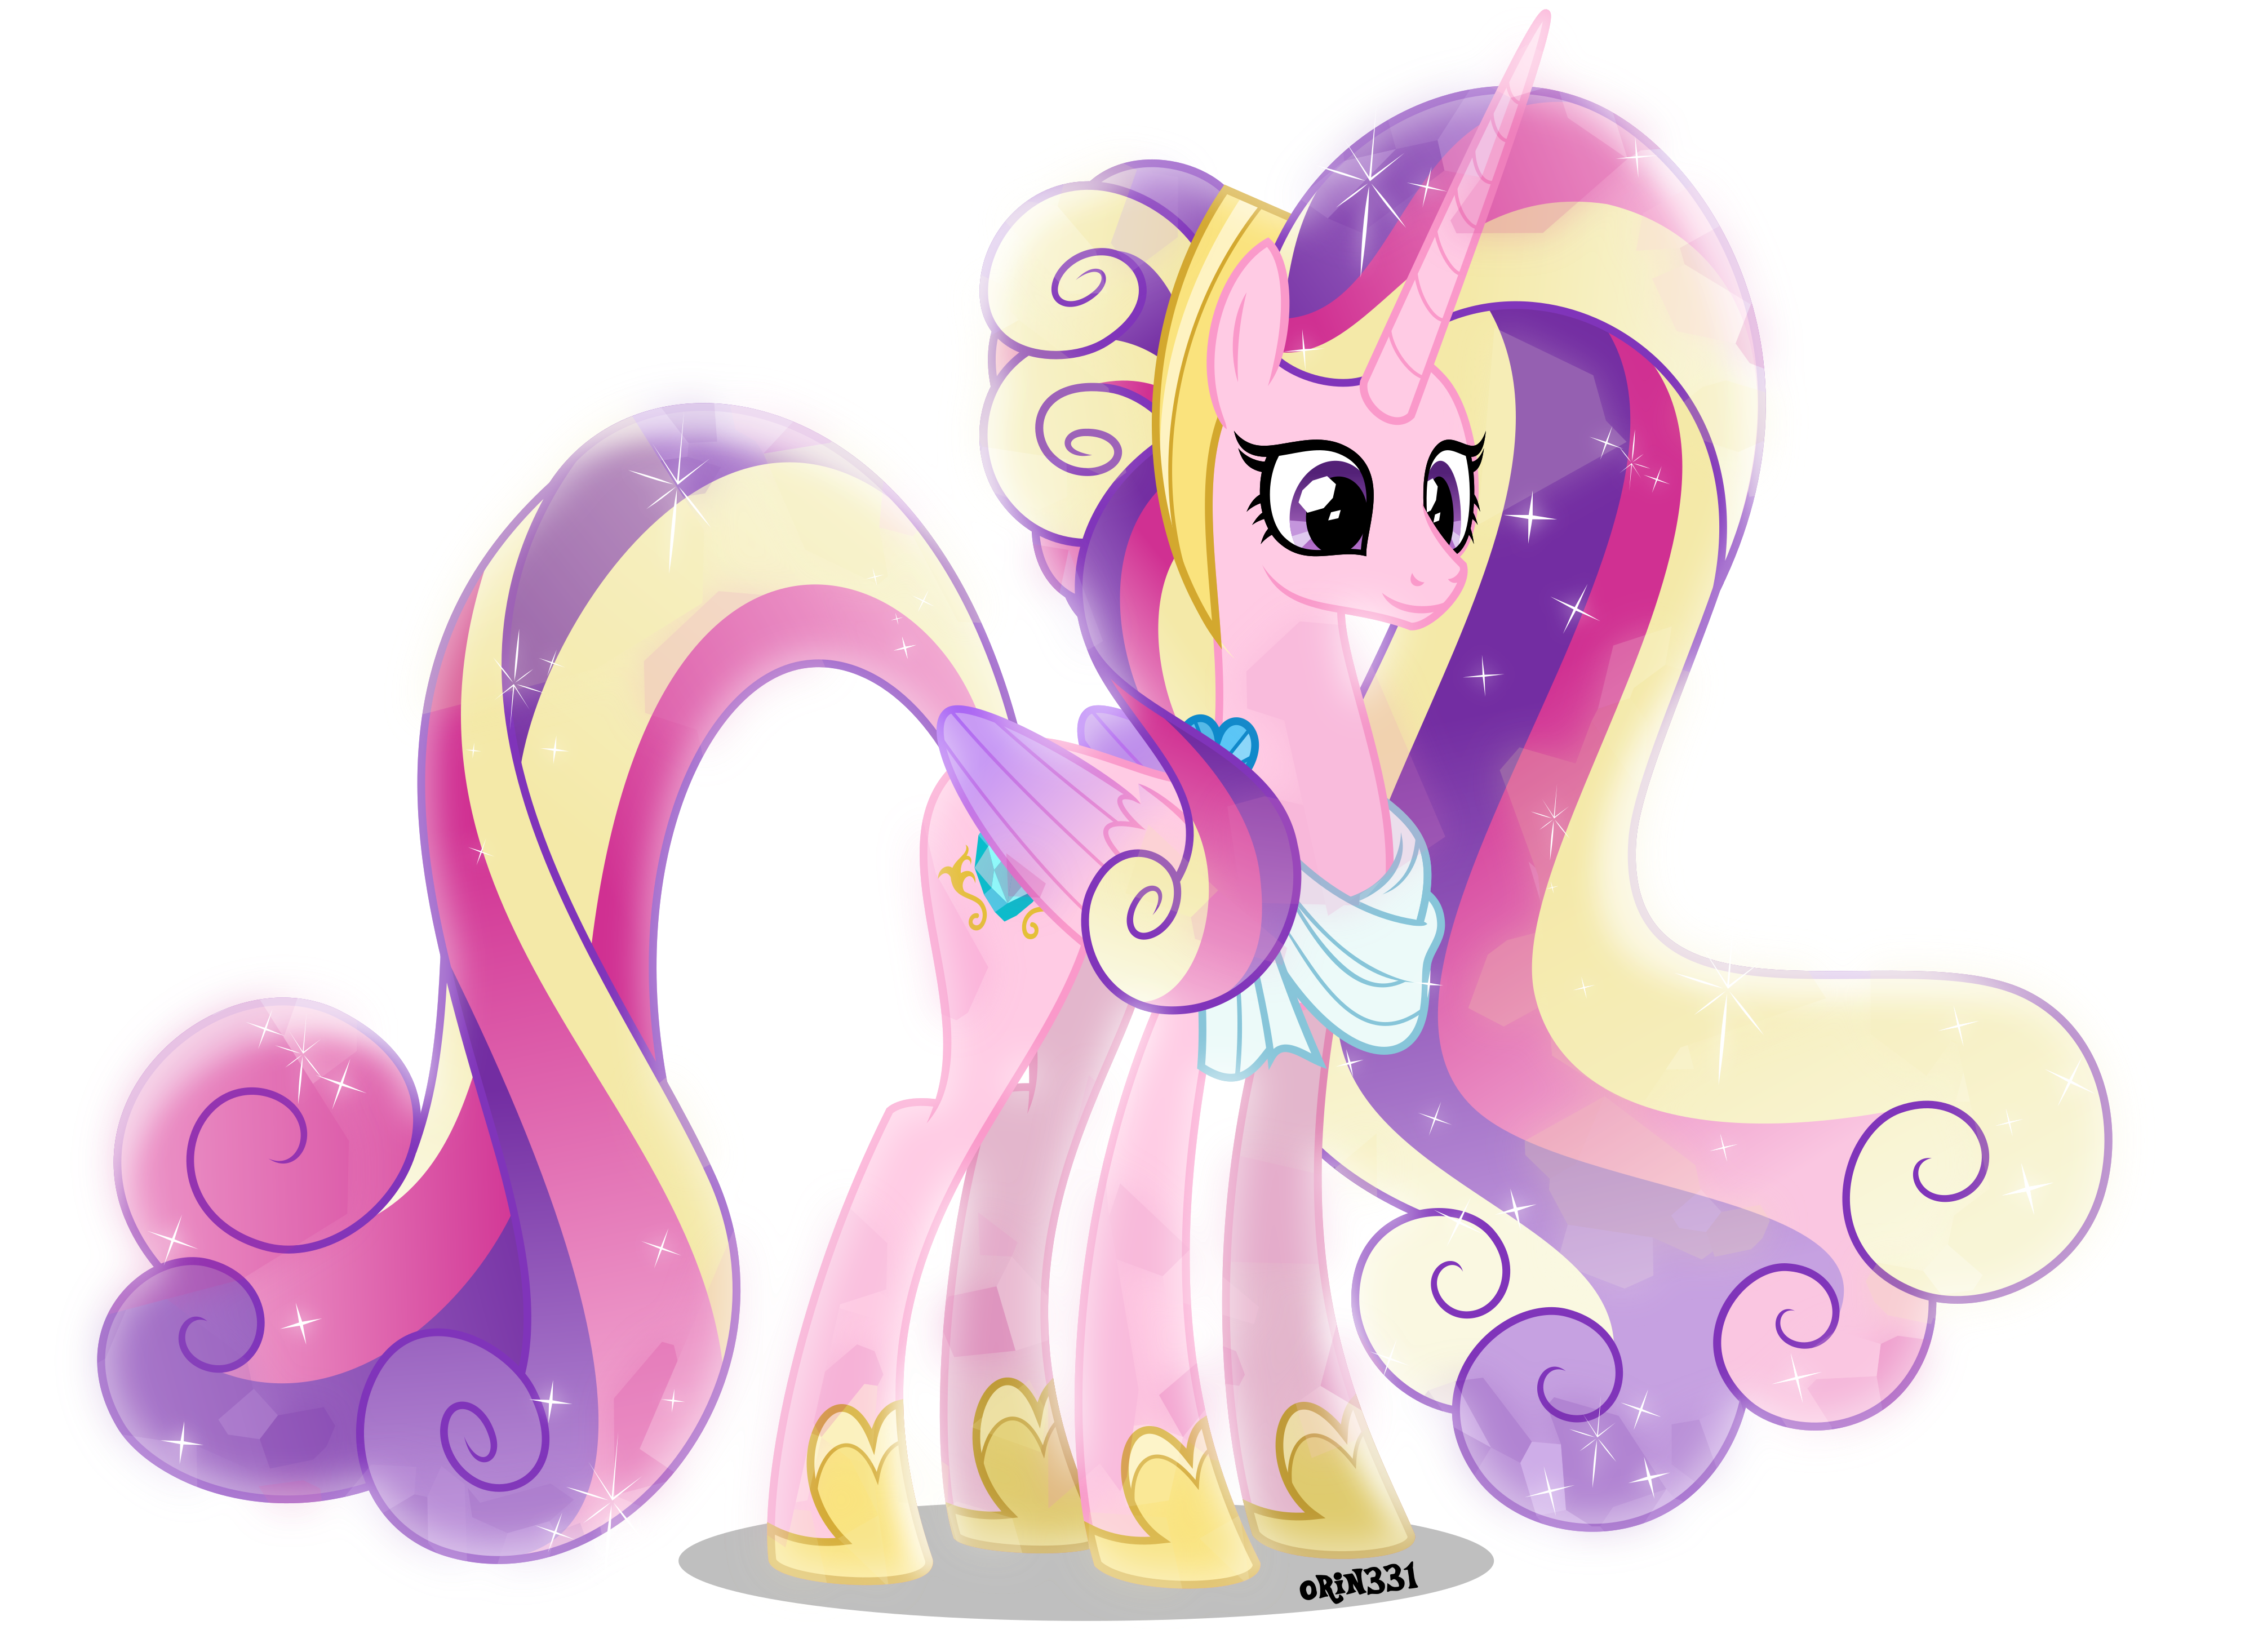 Princess Cadence by Orin331 on DeviantArt